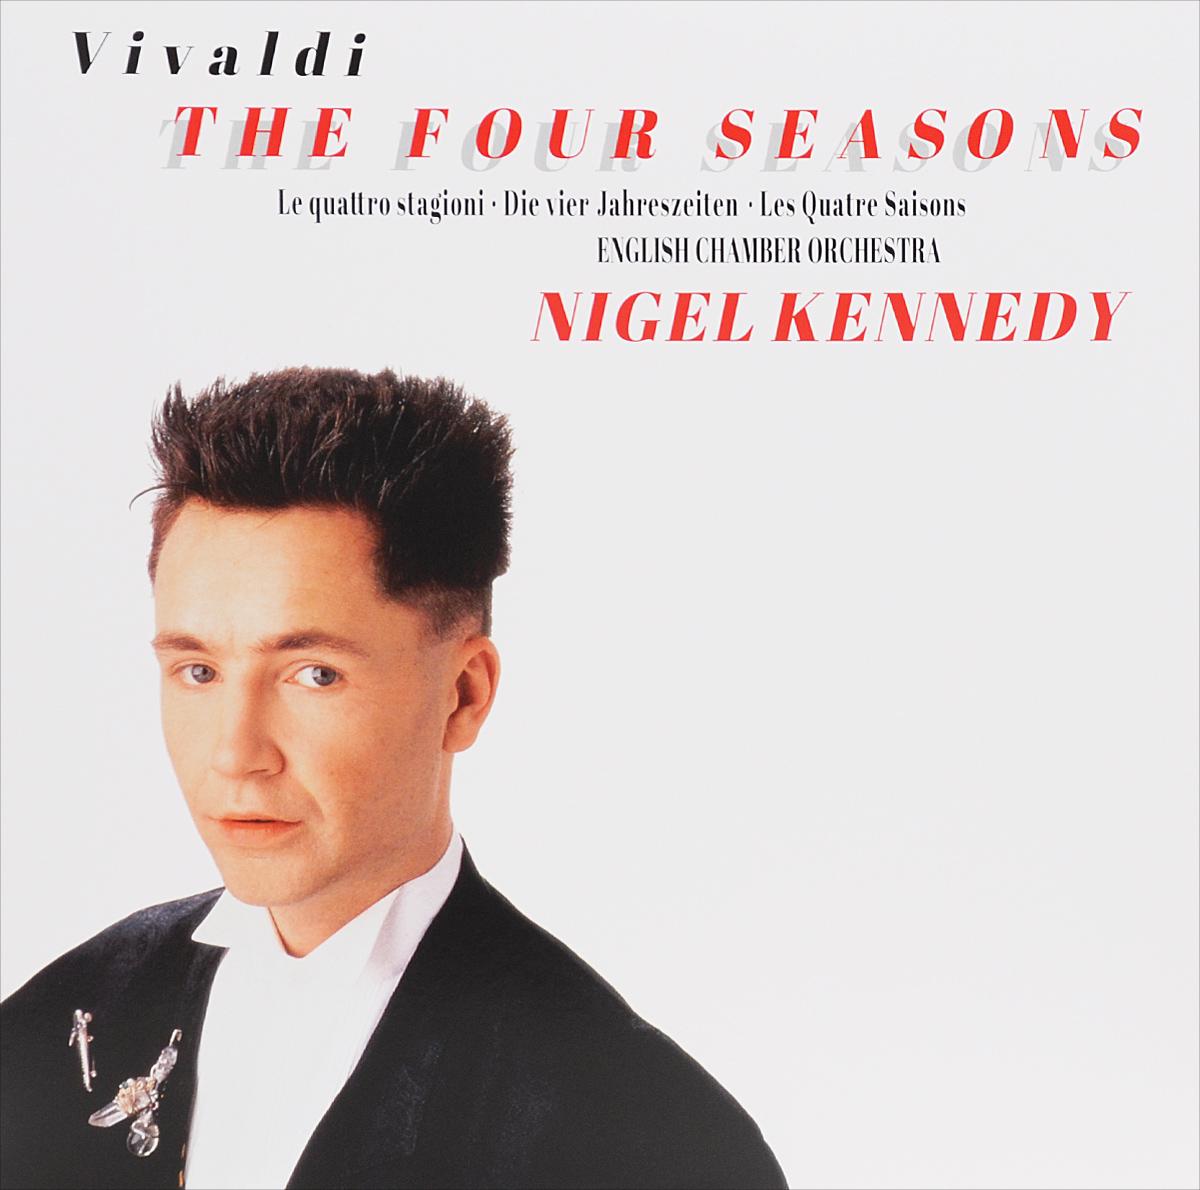 Нейджел Кеннеди,English Chamber Orchestra Nigel Kennedy. Vivaldi. The Four Seasons (LP) болторез kraftool expert kayman 900мм 23280 090